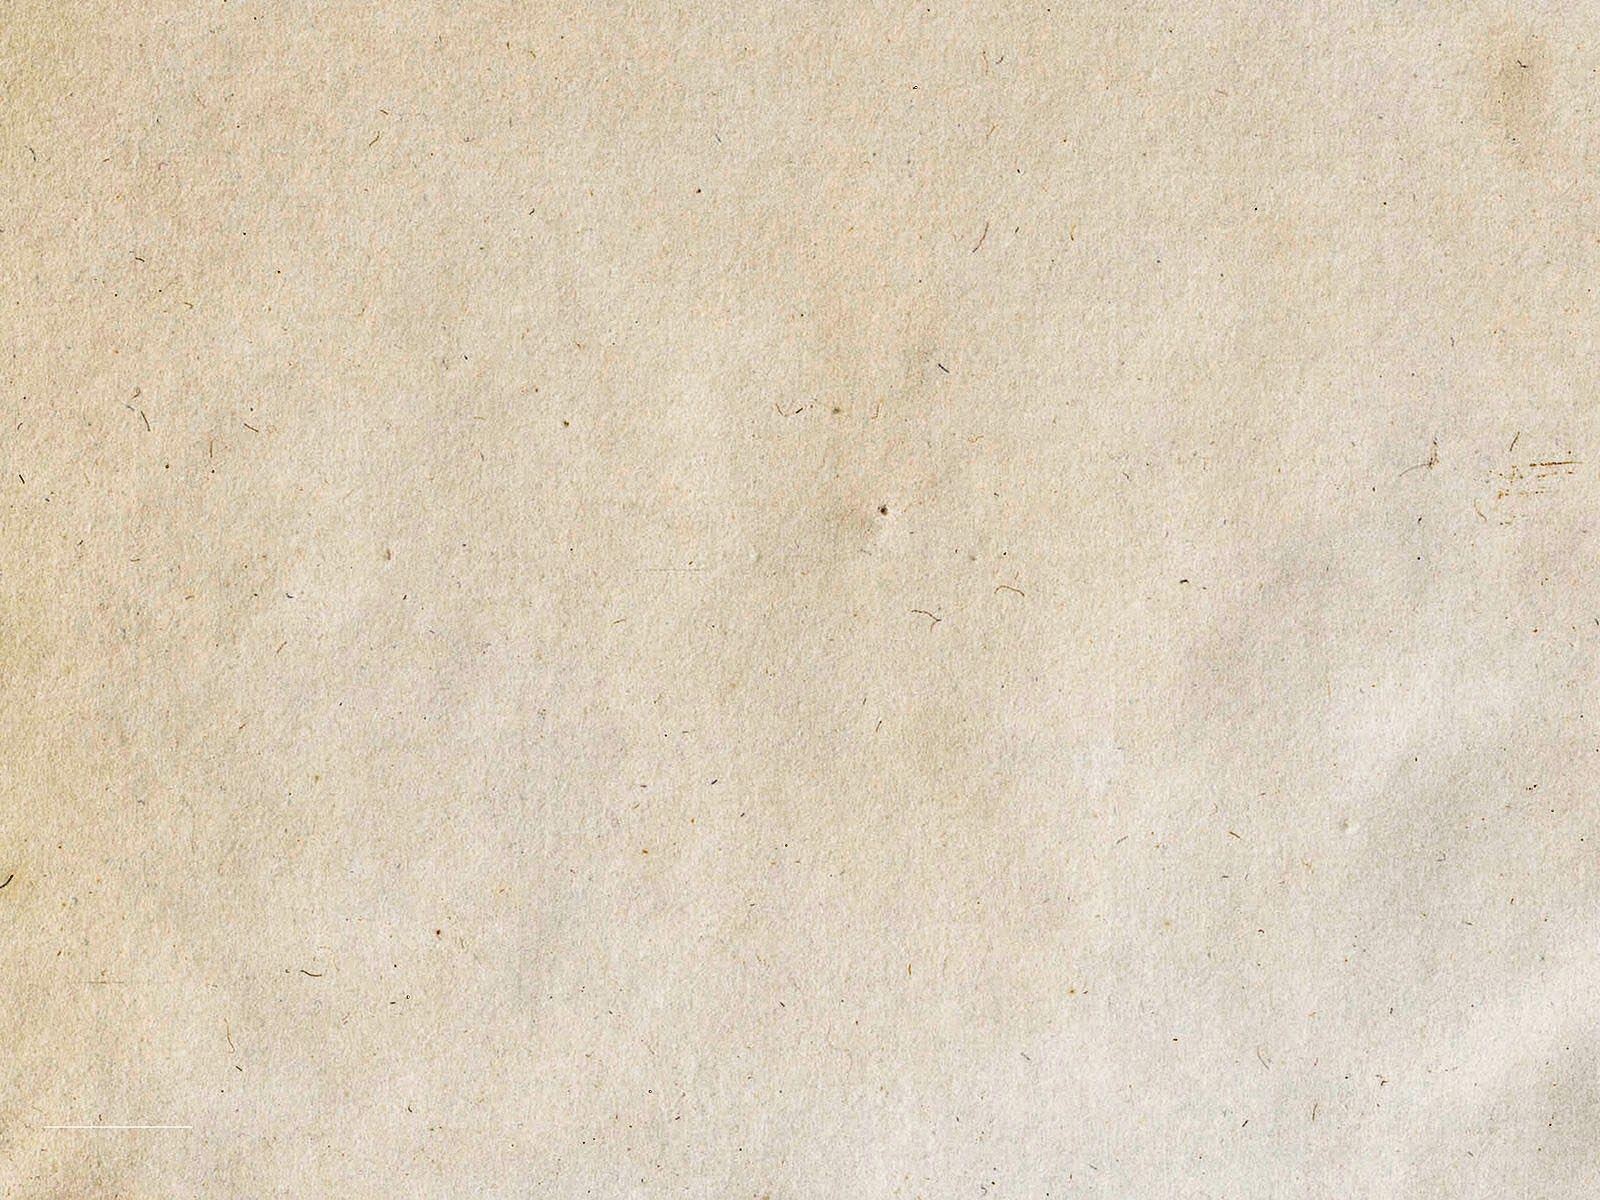 Kraft paper texture maps texturise free seamless textures